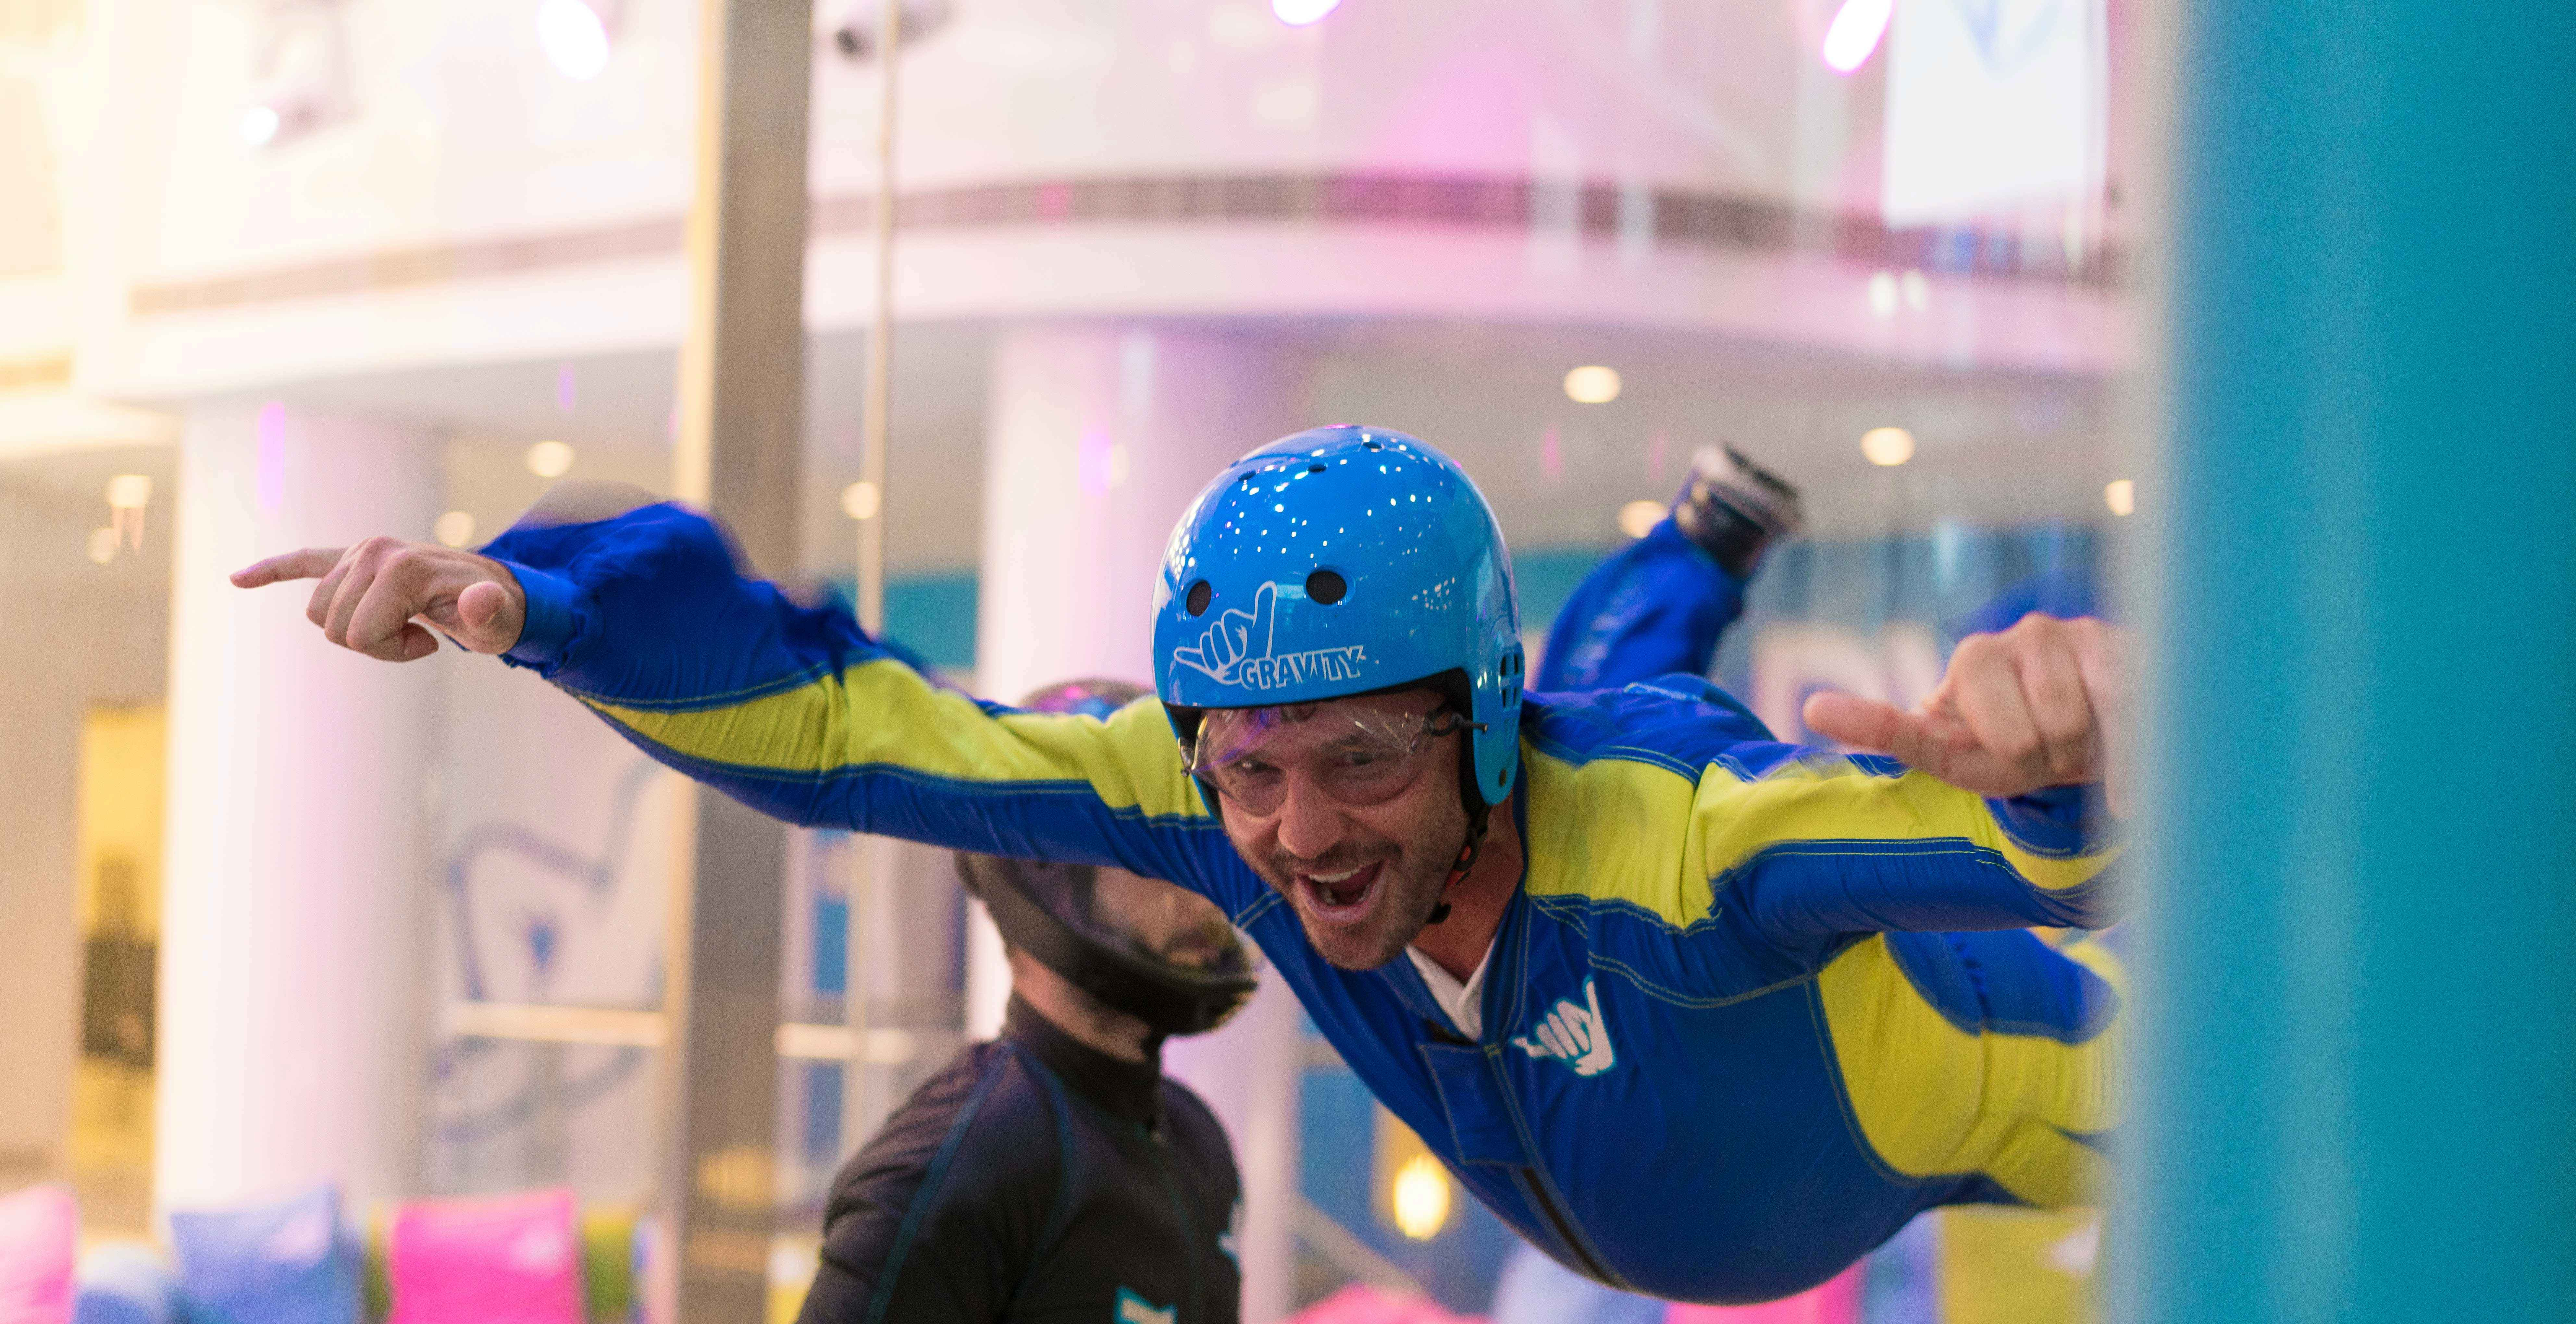 Indoor Skydiving is fun!